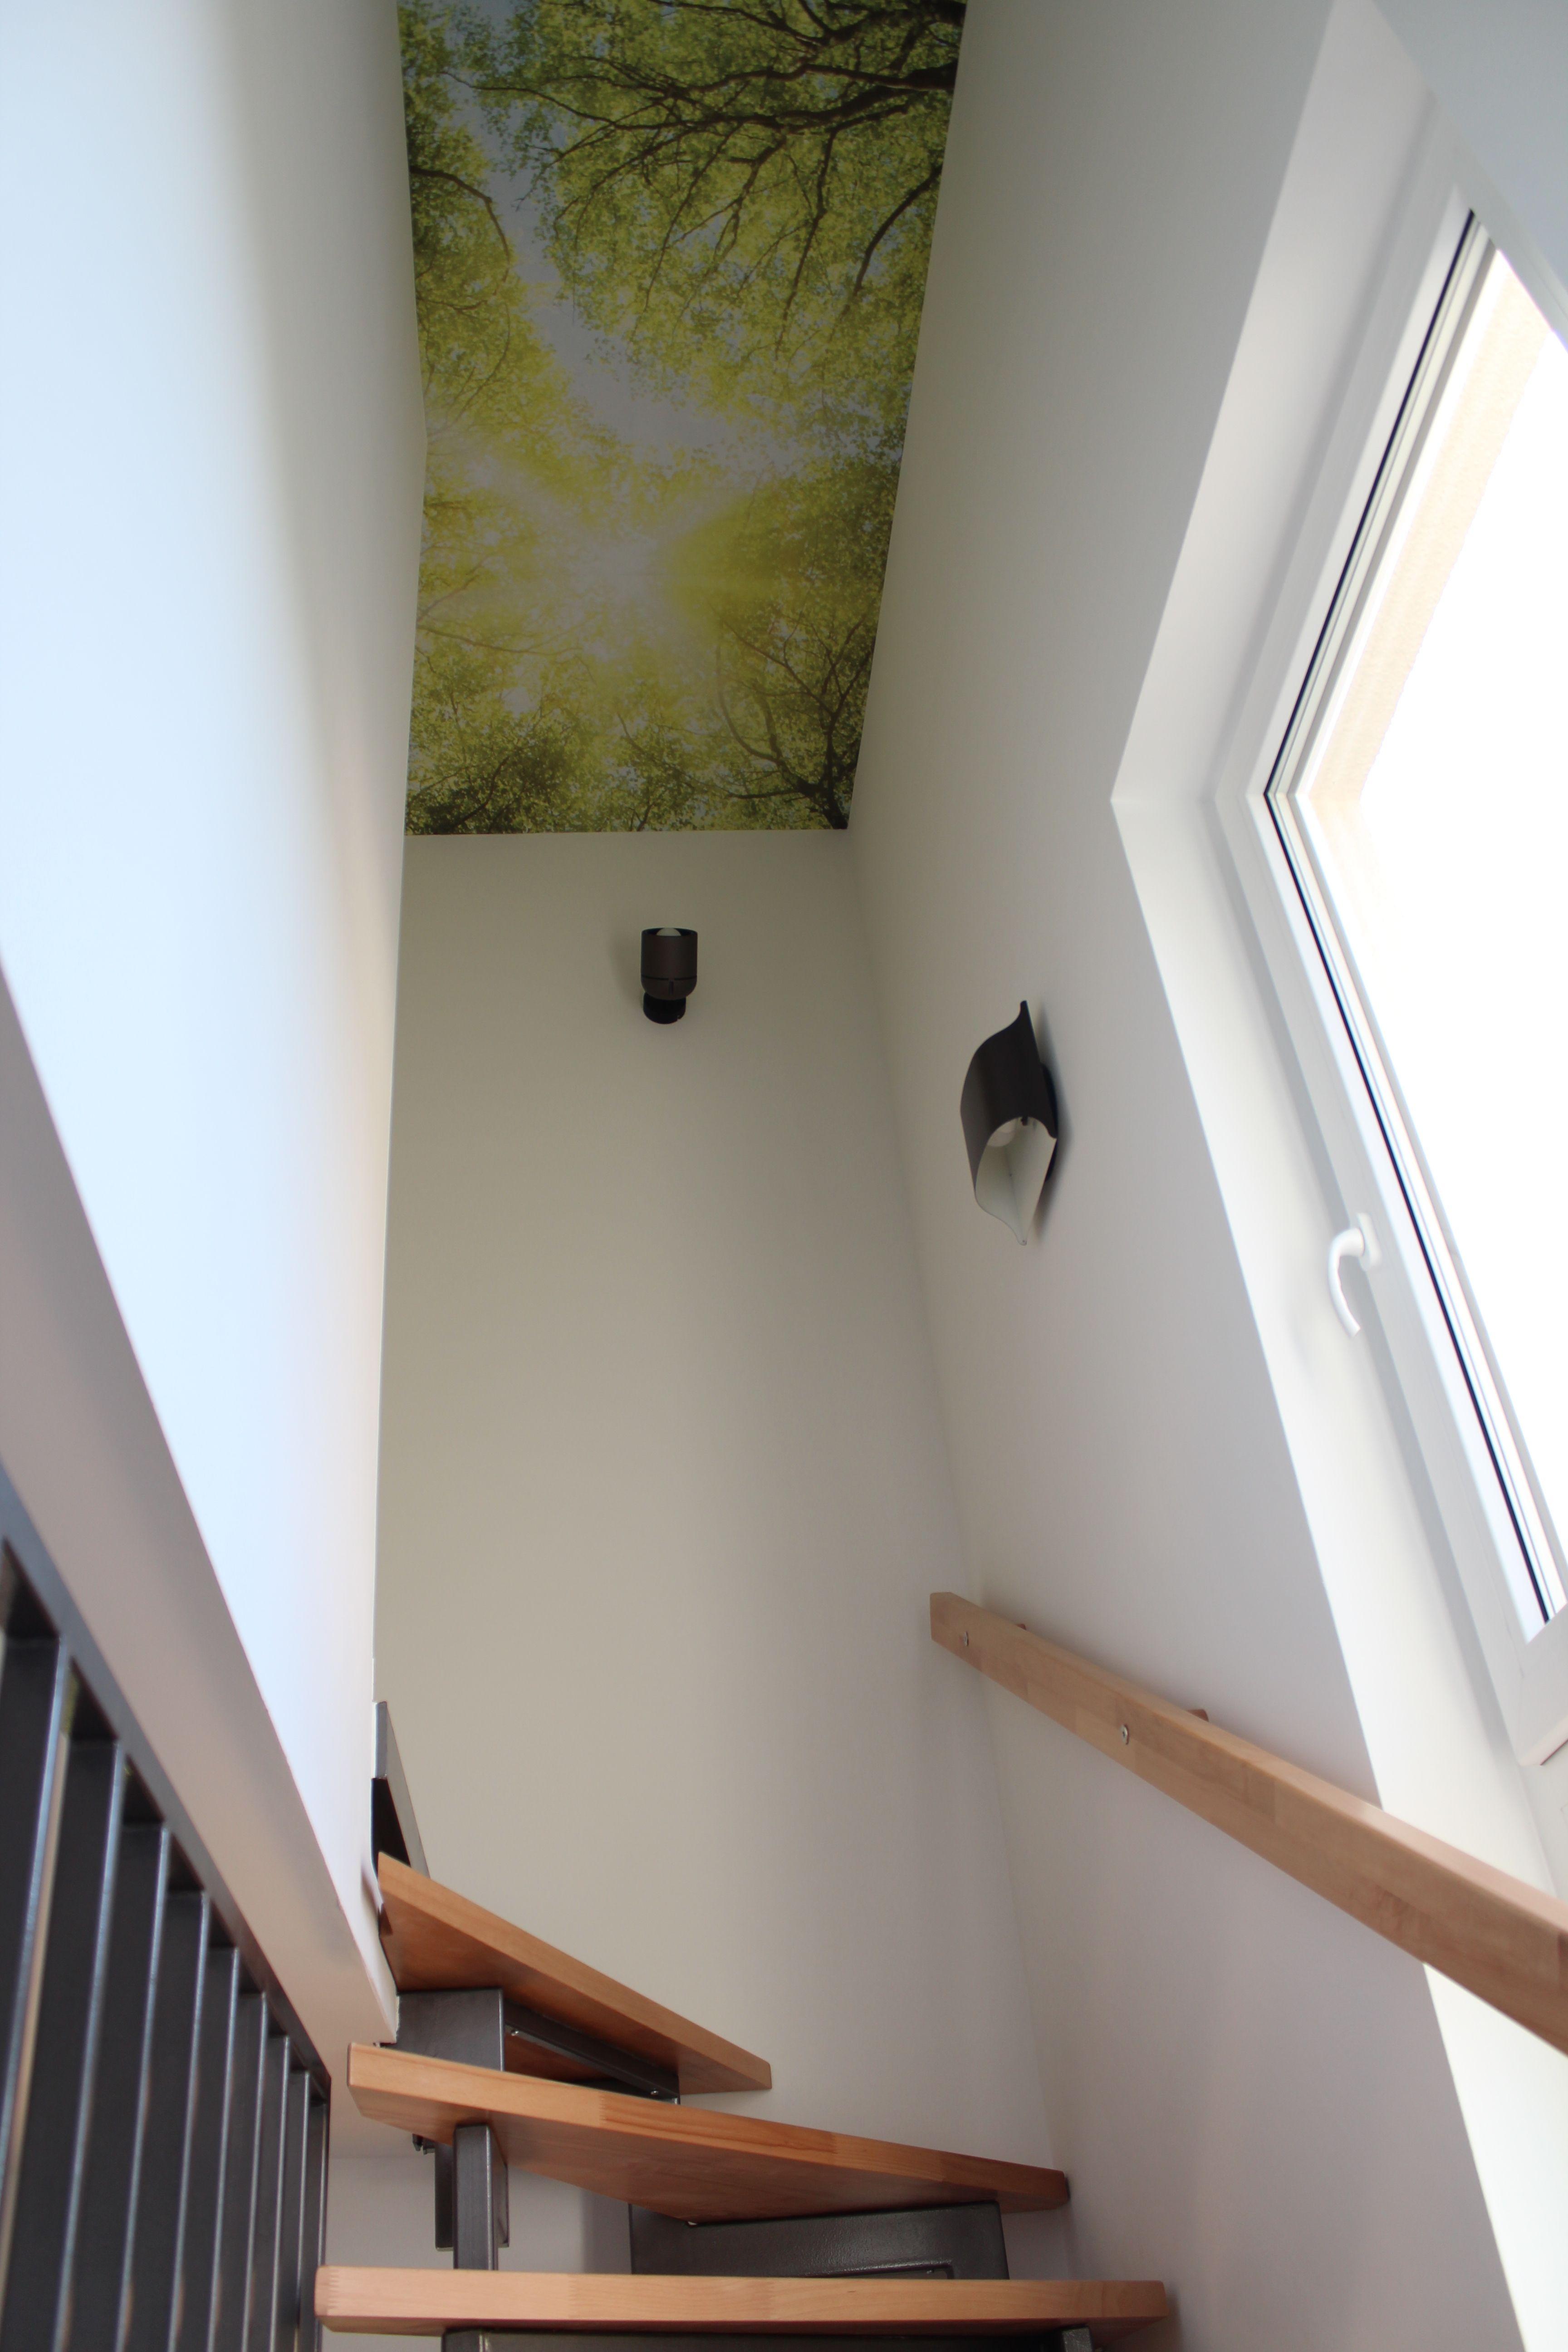 fototapete wald im treppenhaus home pinterest. Black Bedroom Furniture Sets. Home Design Ideas